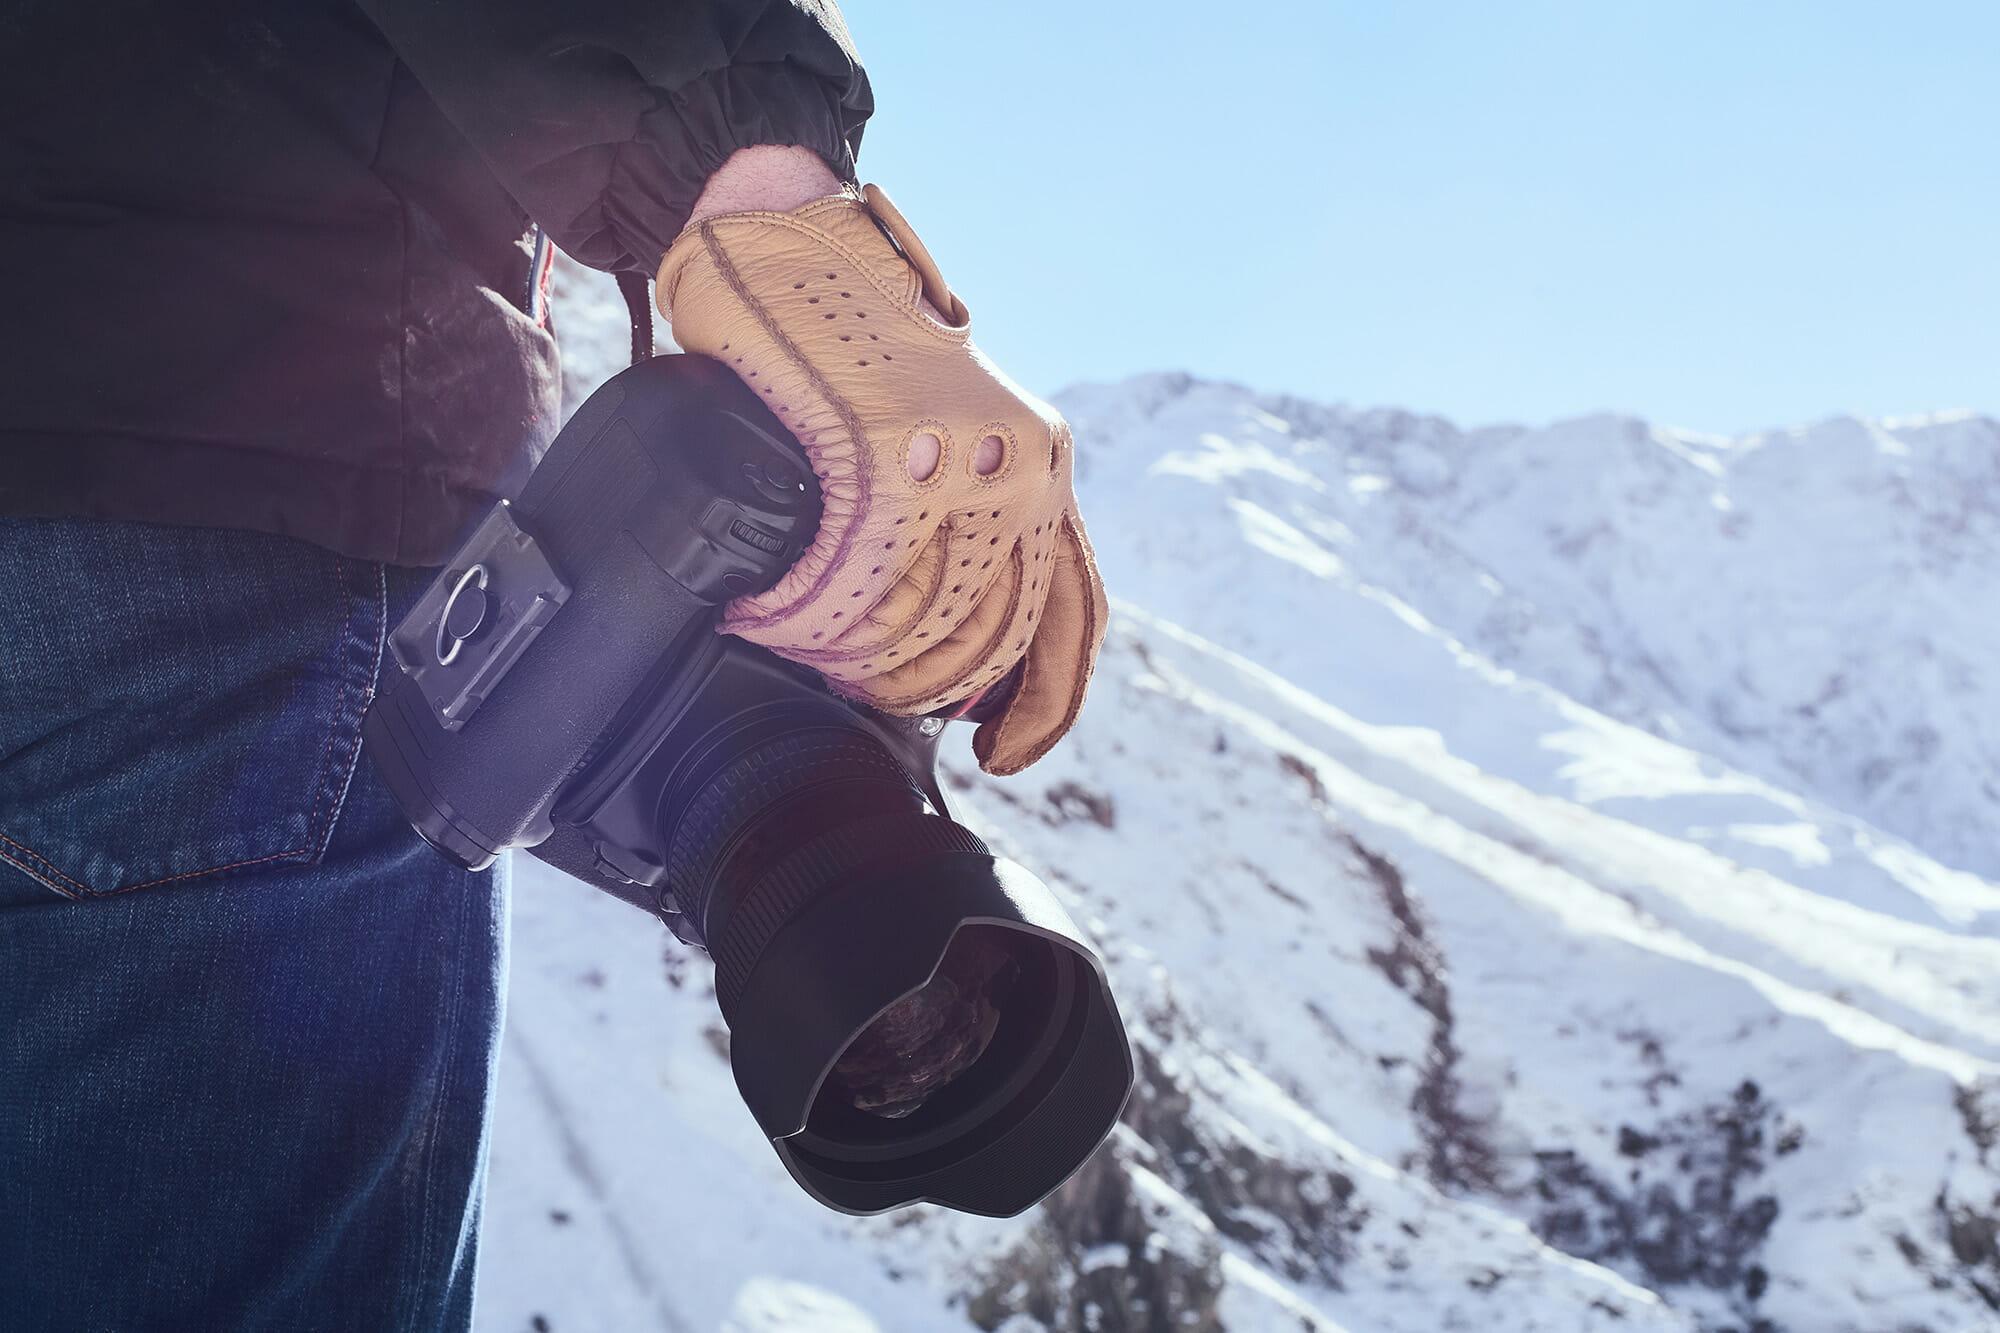 photographer camera dslr mountain snow glove blue sky